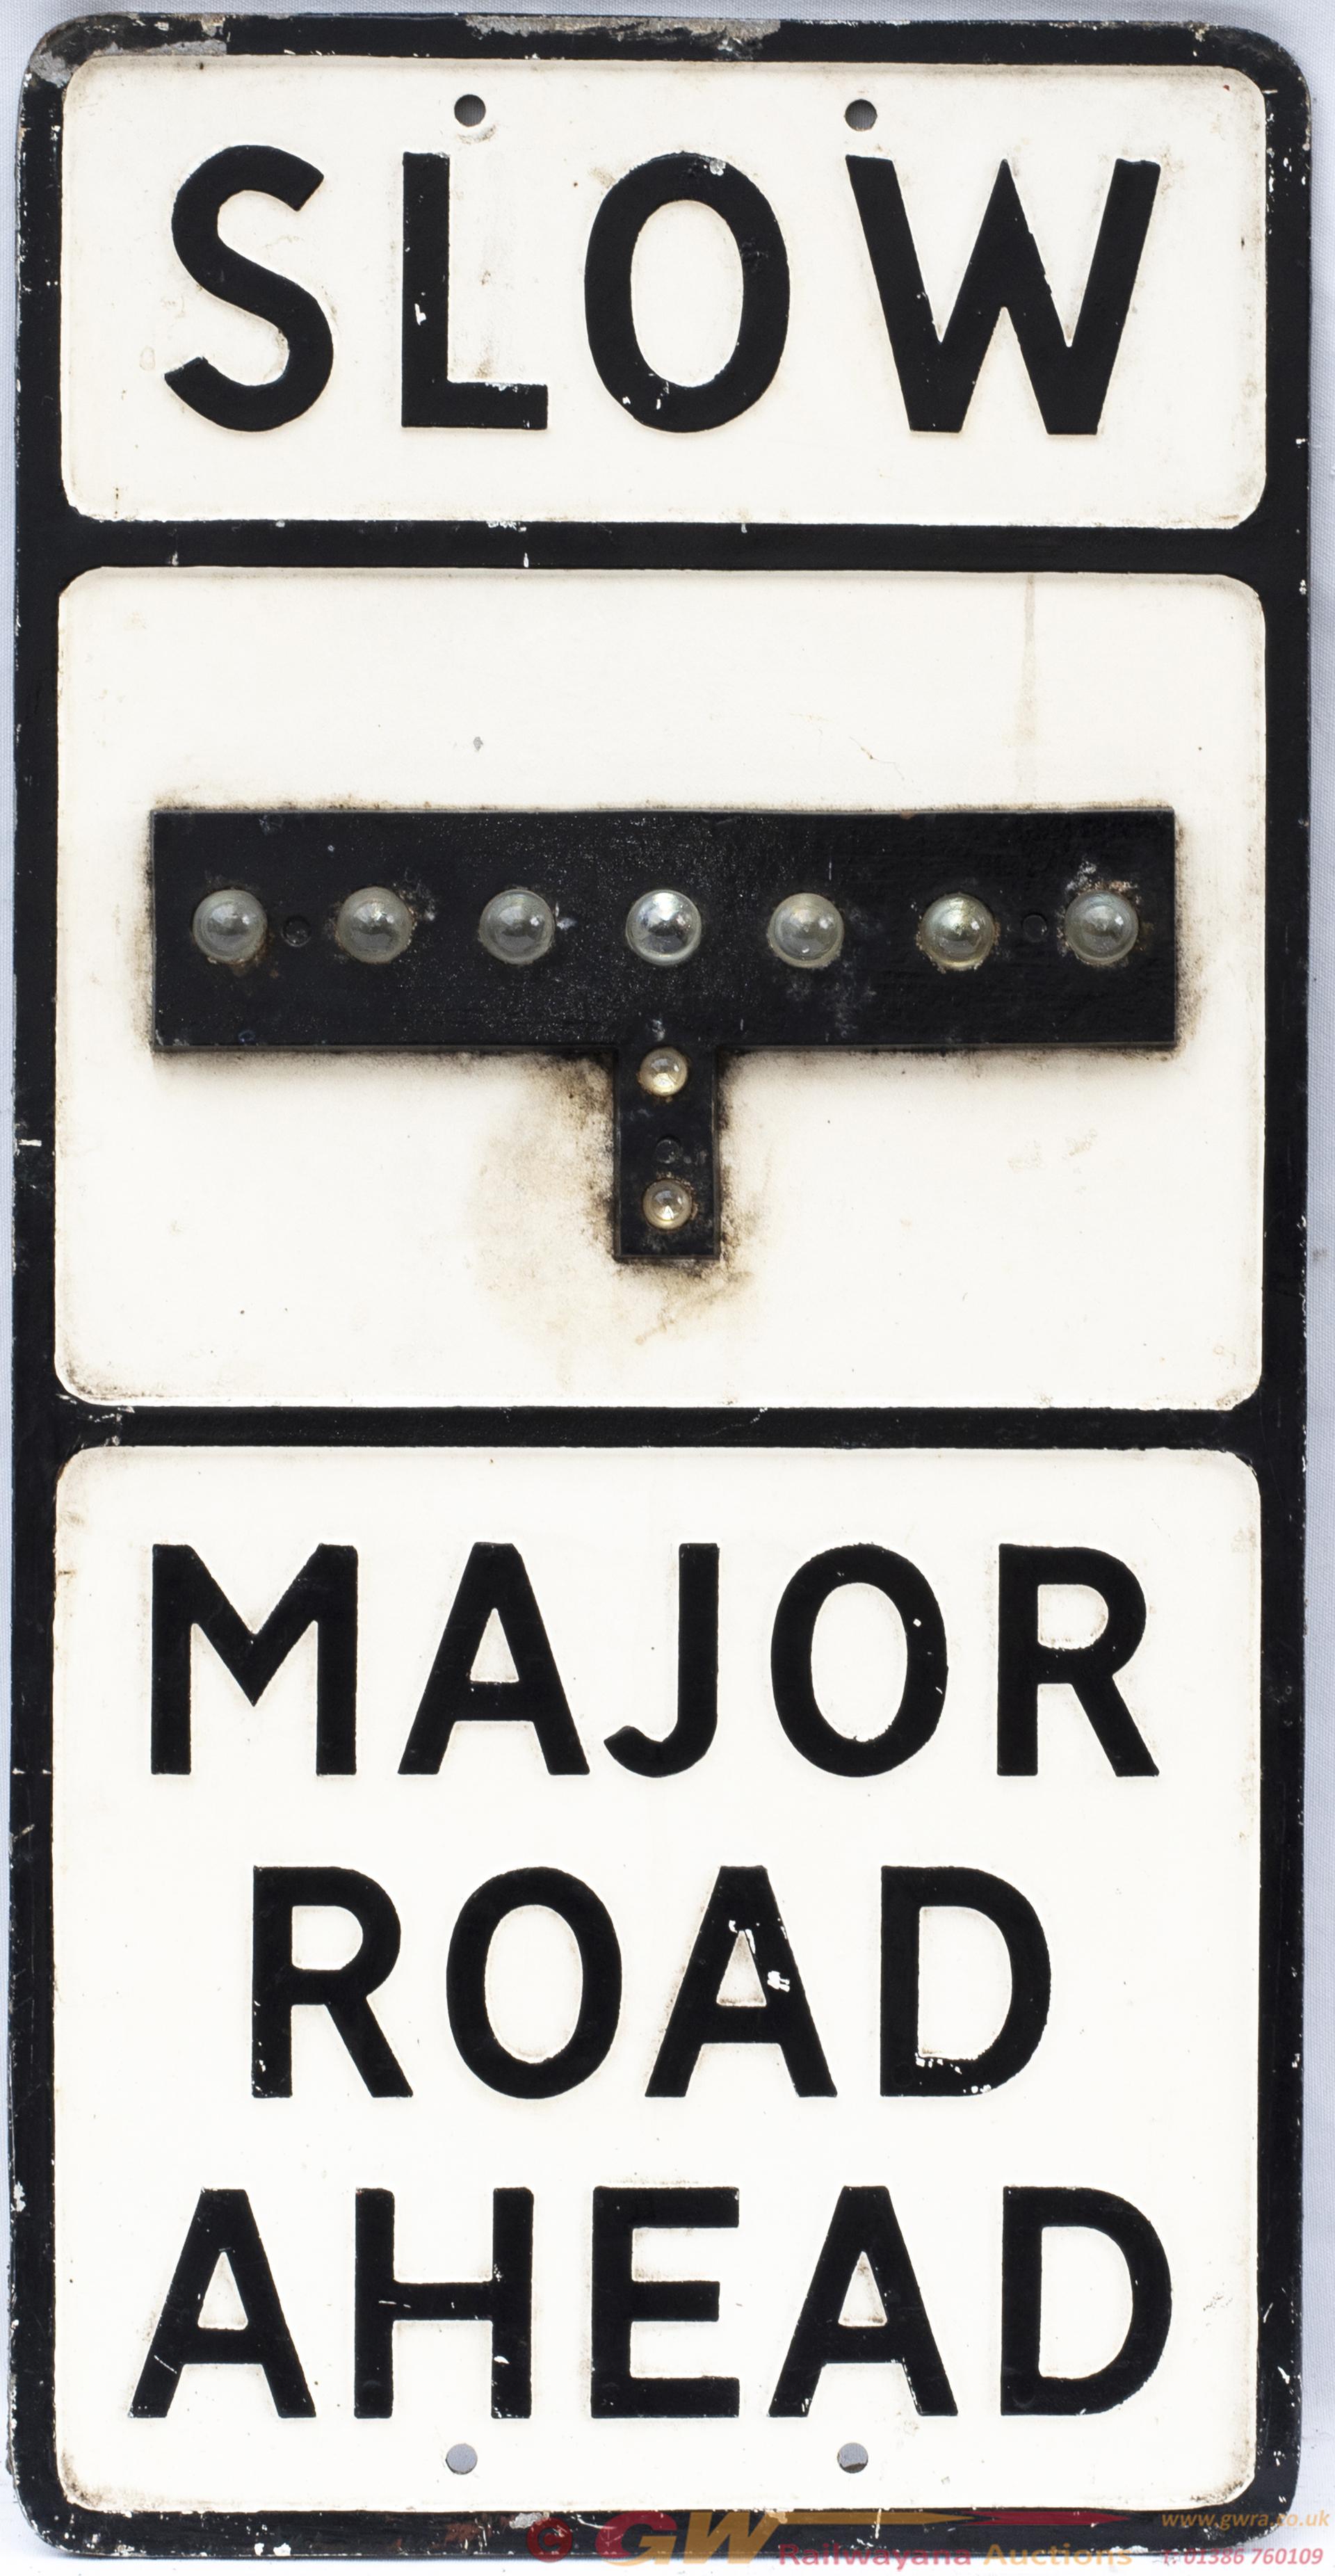 Motoring Road Sign SLOW MAJOR ROAD AHEAD. In